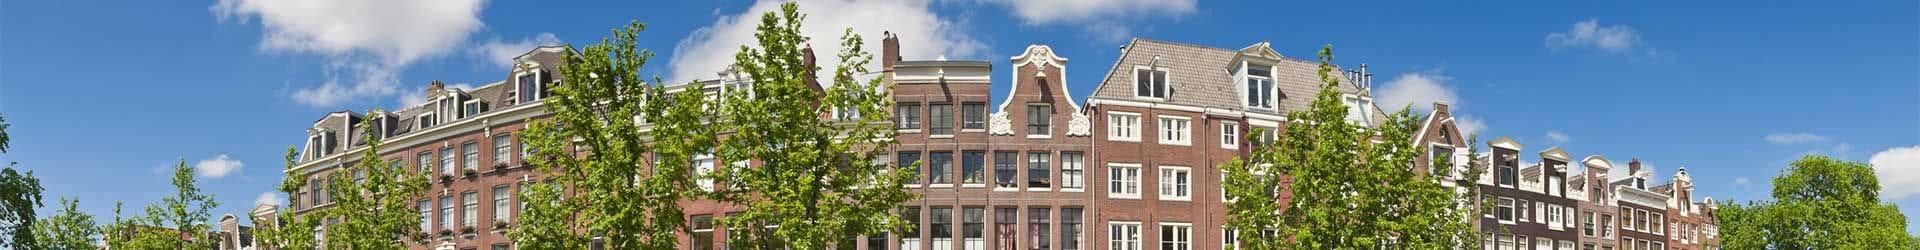 Panorama Amsterdamse huizen